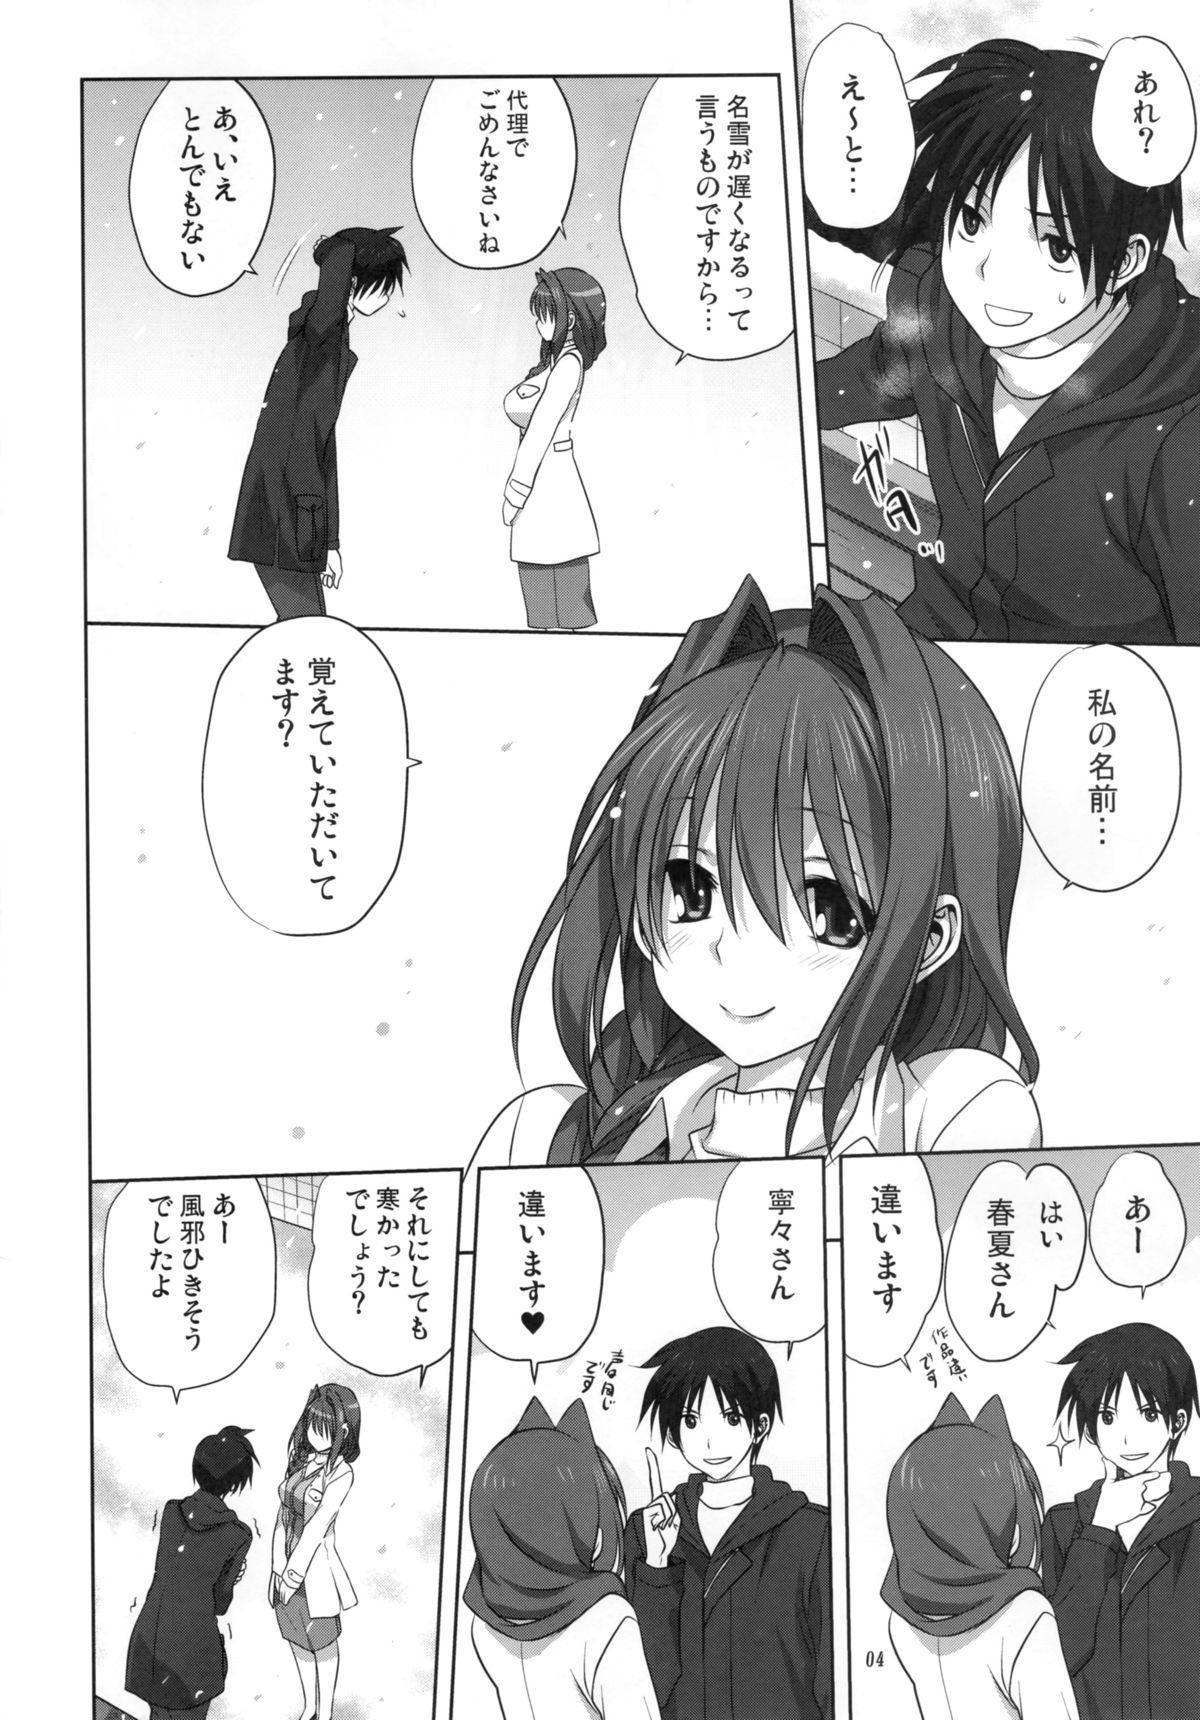 Akiko-san to Issho 16 2